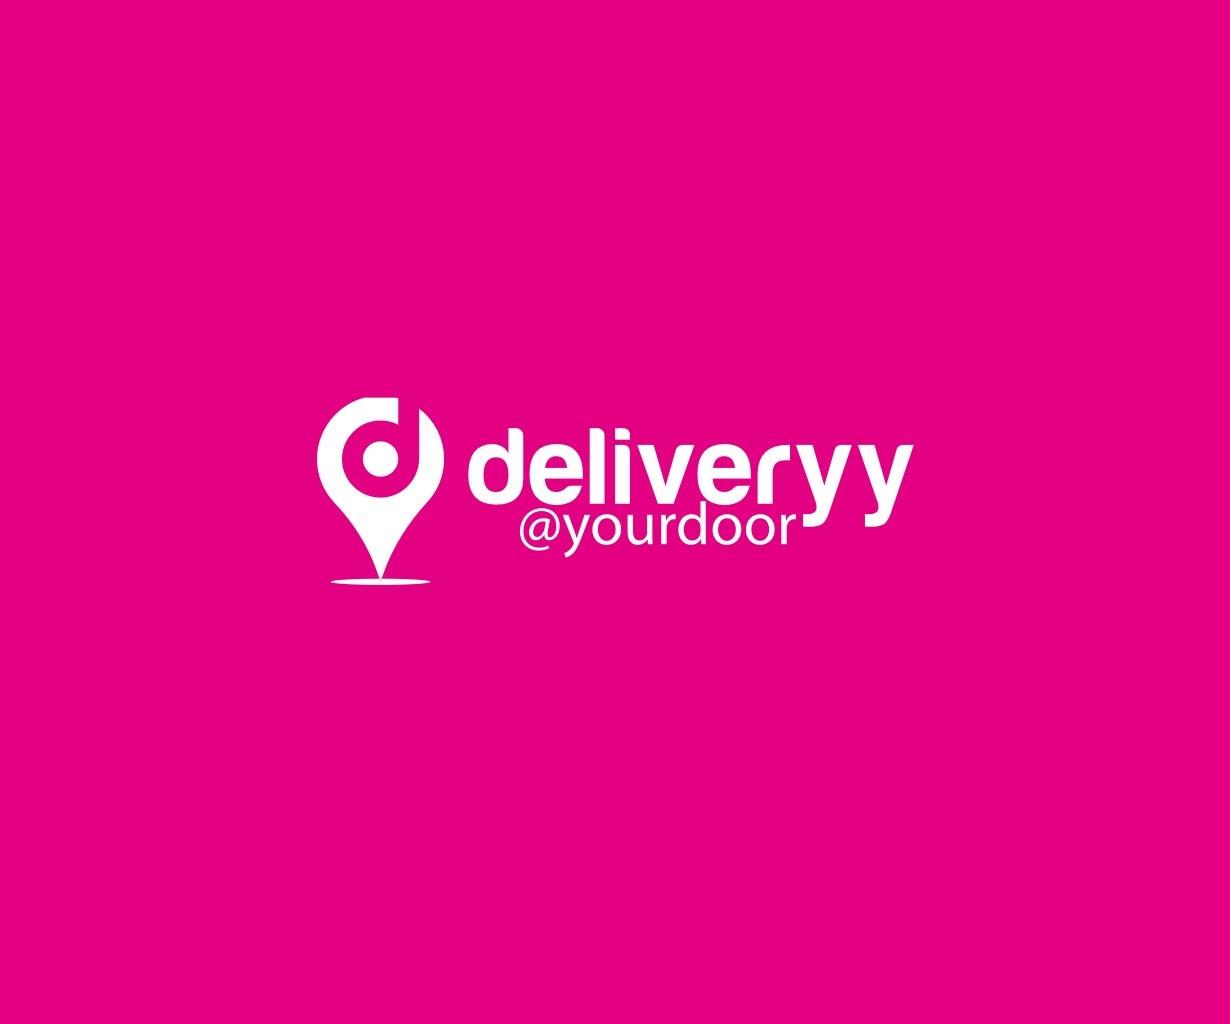 Deliveryy